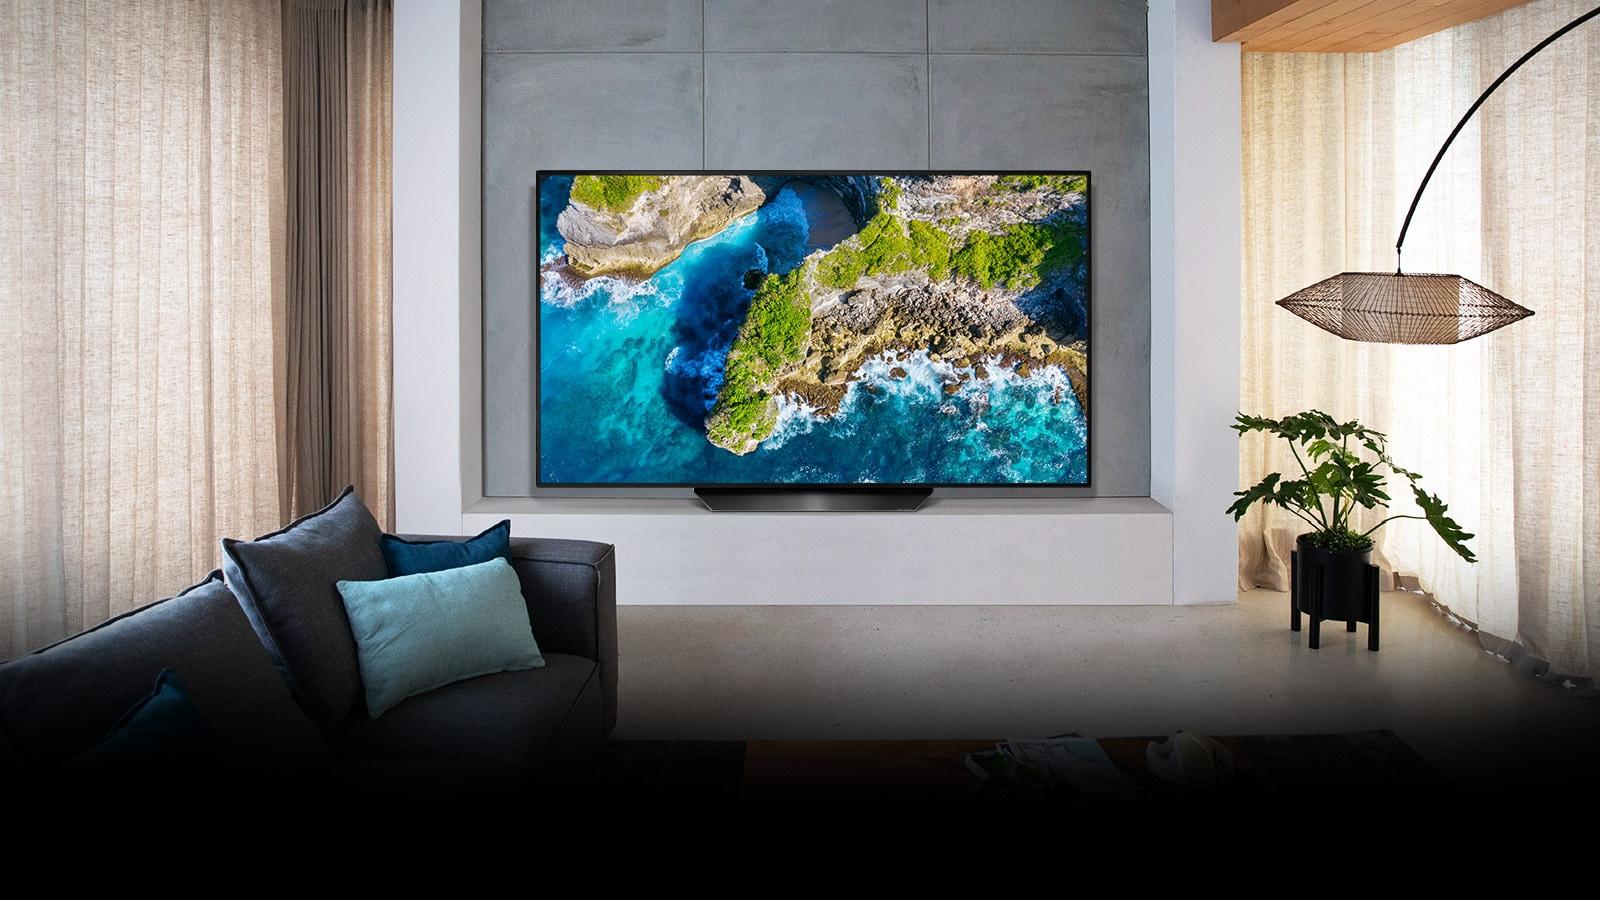 TV s pogledom na naravo iz zraka v razkošni hišni okolici